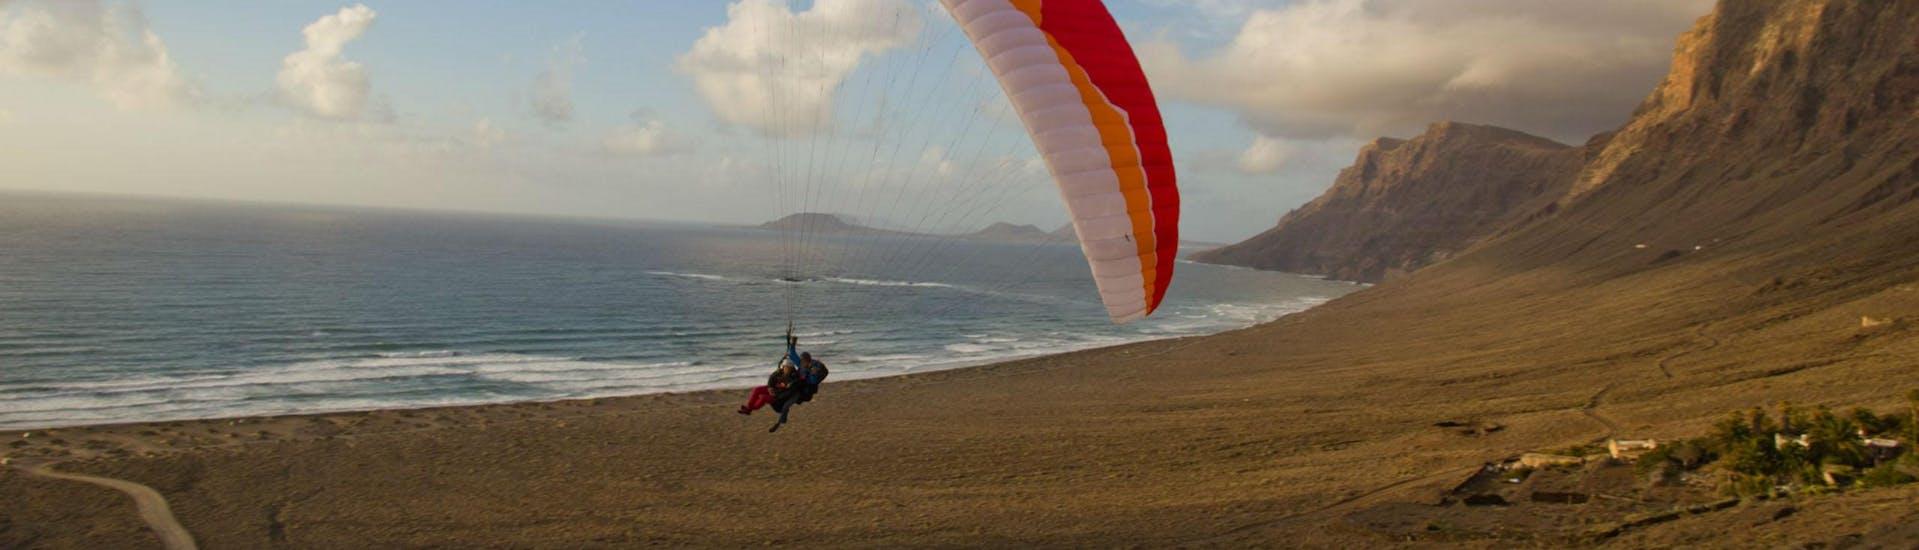 Tandem Paragliding in Lanzarote - Discovery Flight